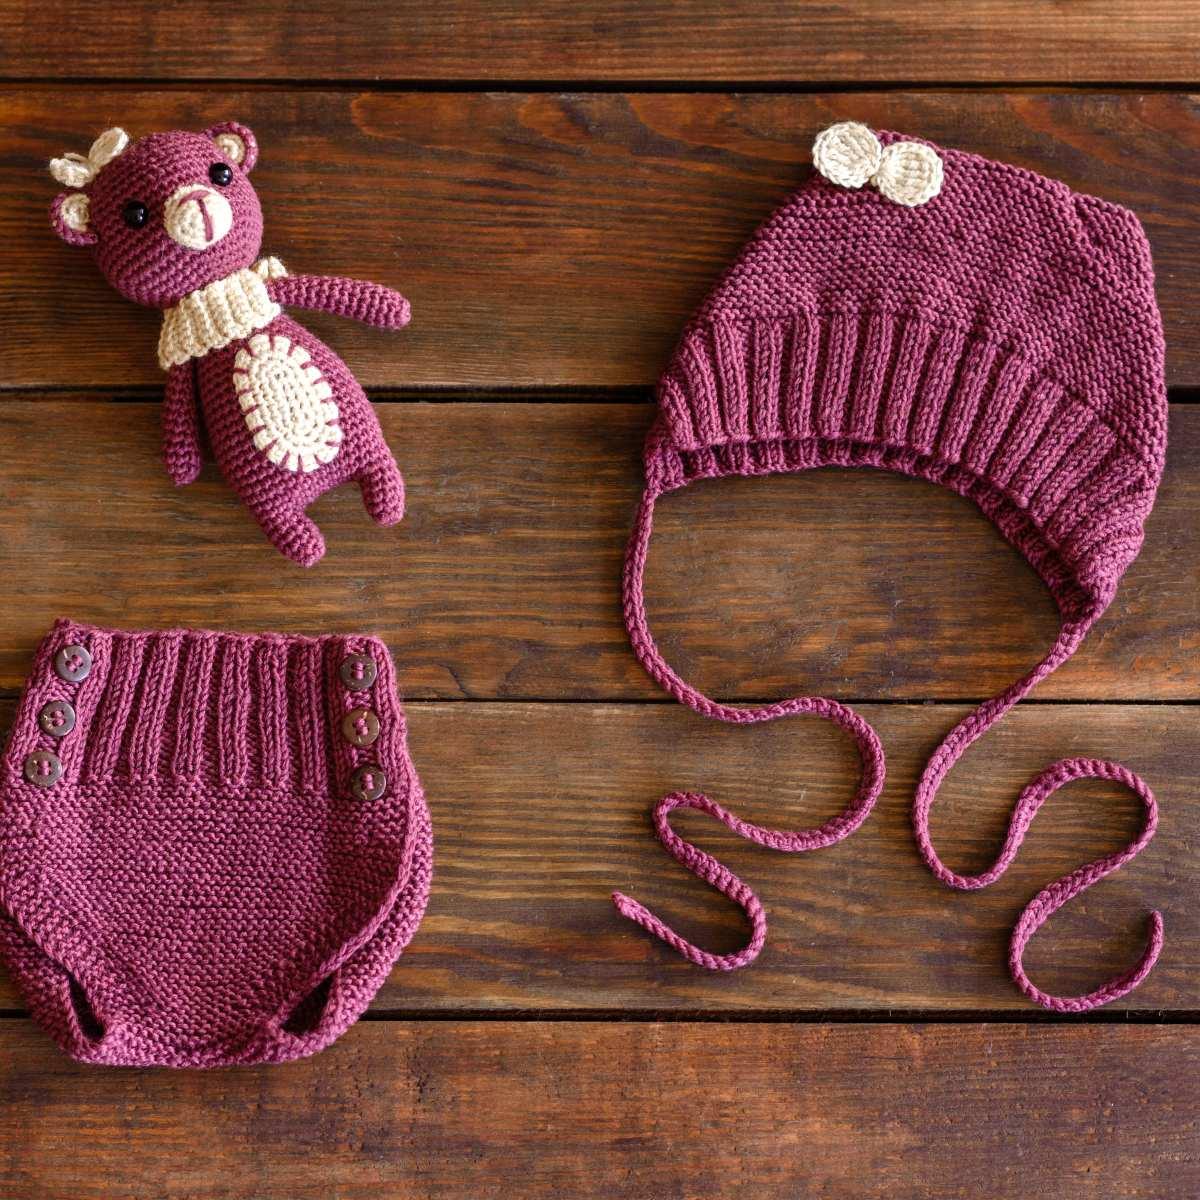 crochet tutorial for Knitting Symbols by CET